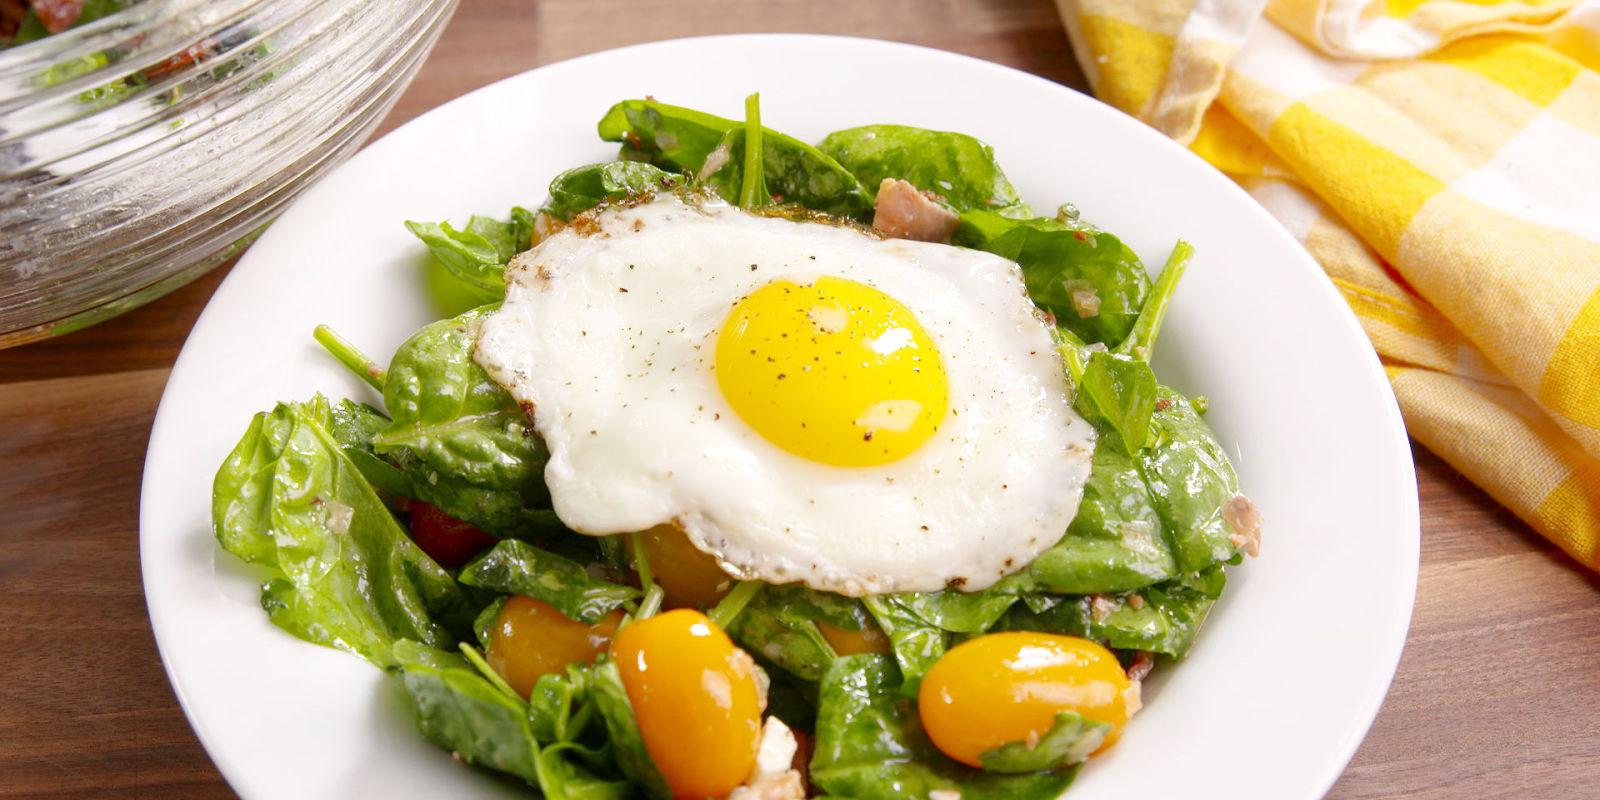 Healthy Breakfast Recipes With Eggs  16 Healthy Egg Recipes Healthy Ways To Make Eggs—Delish